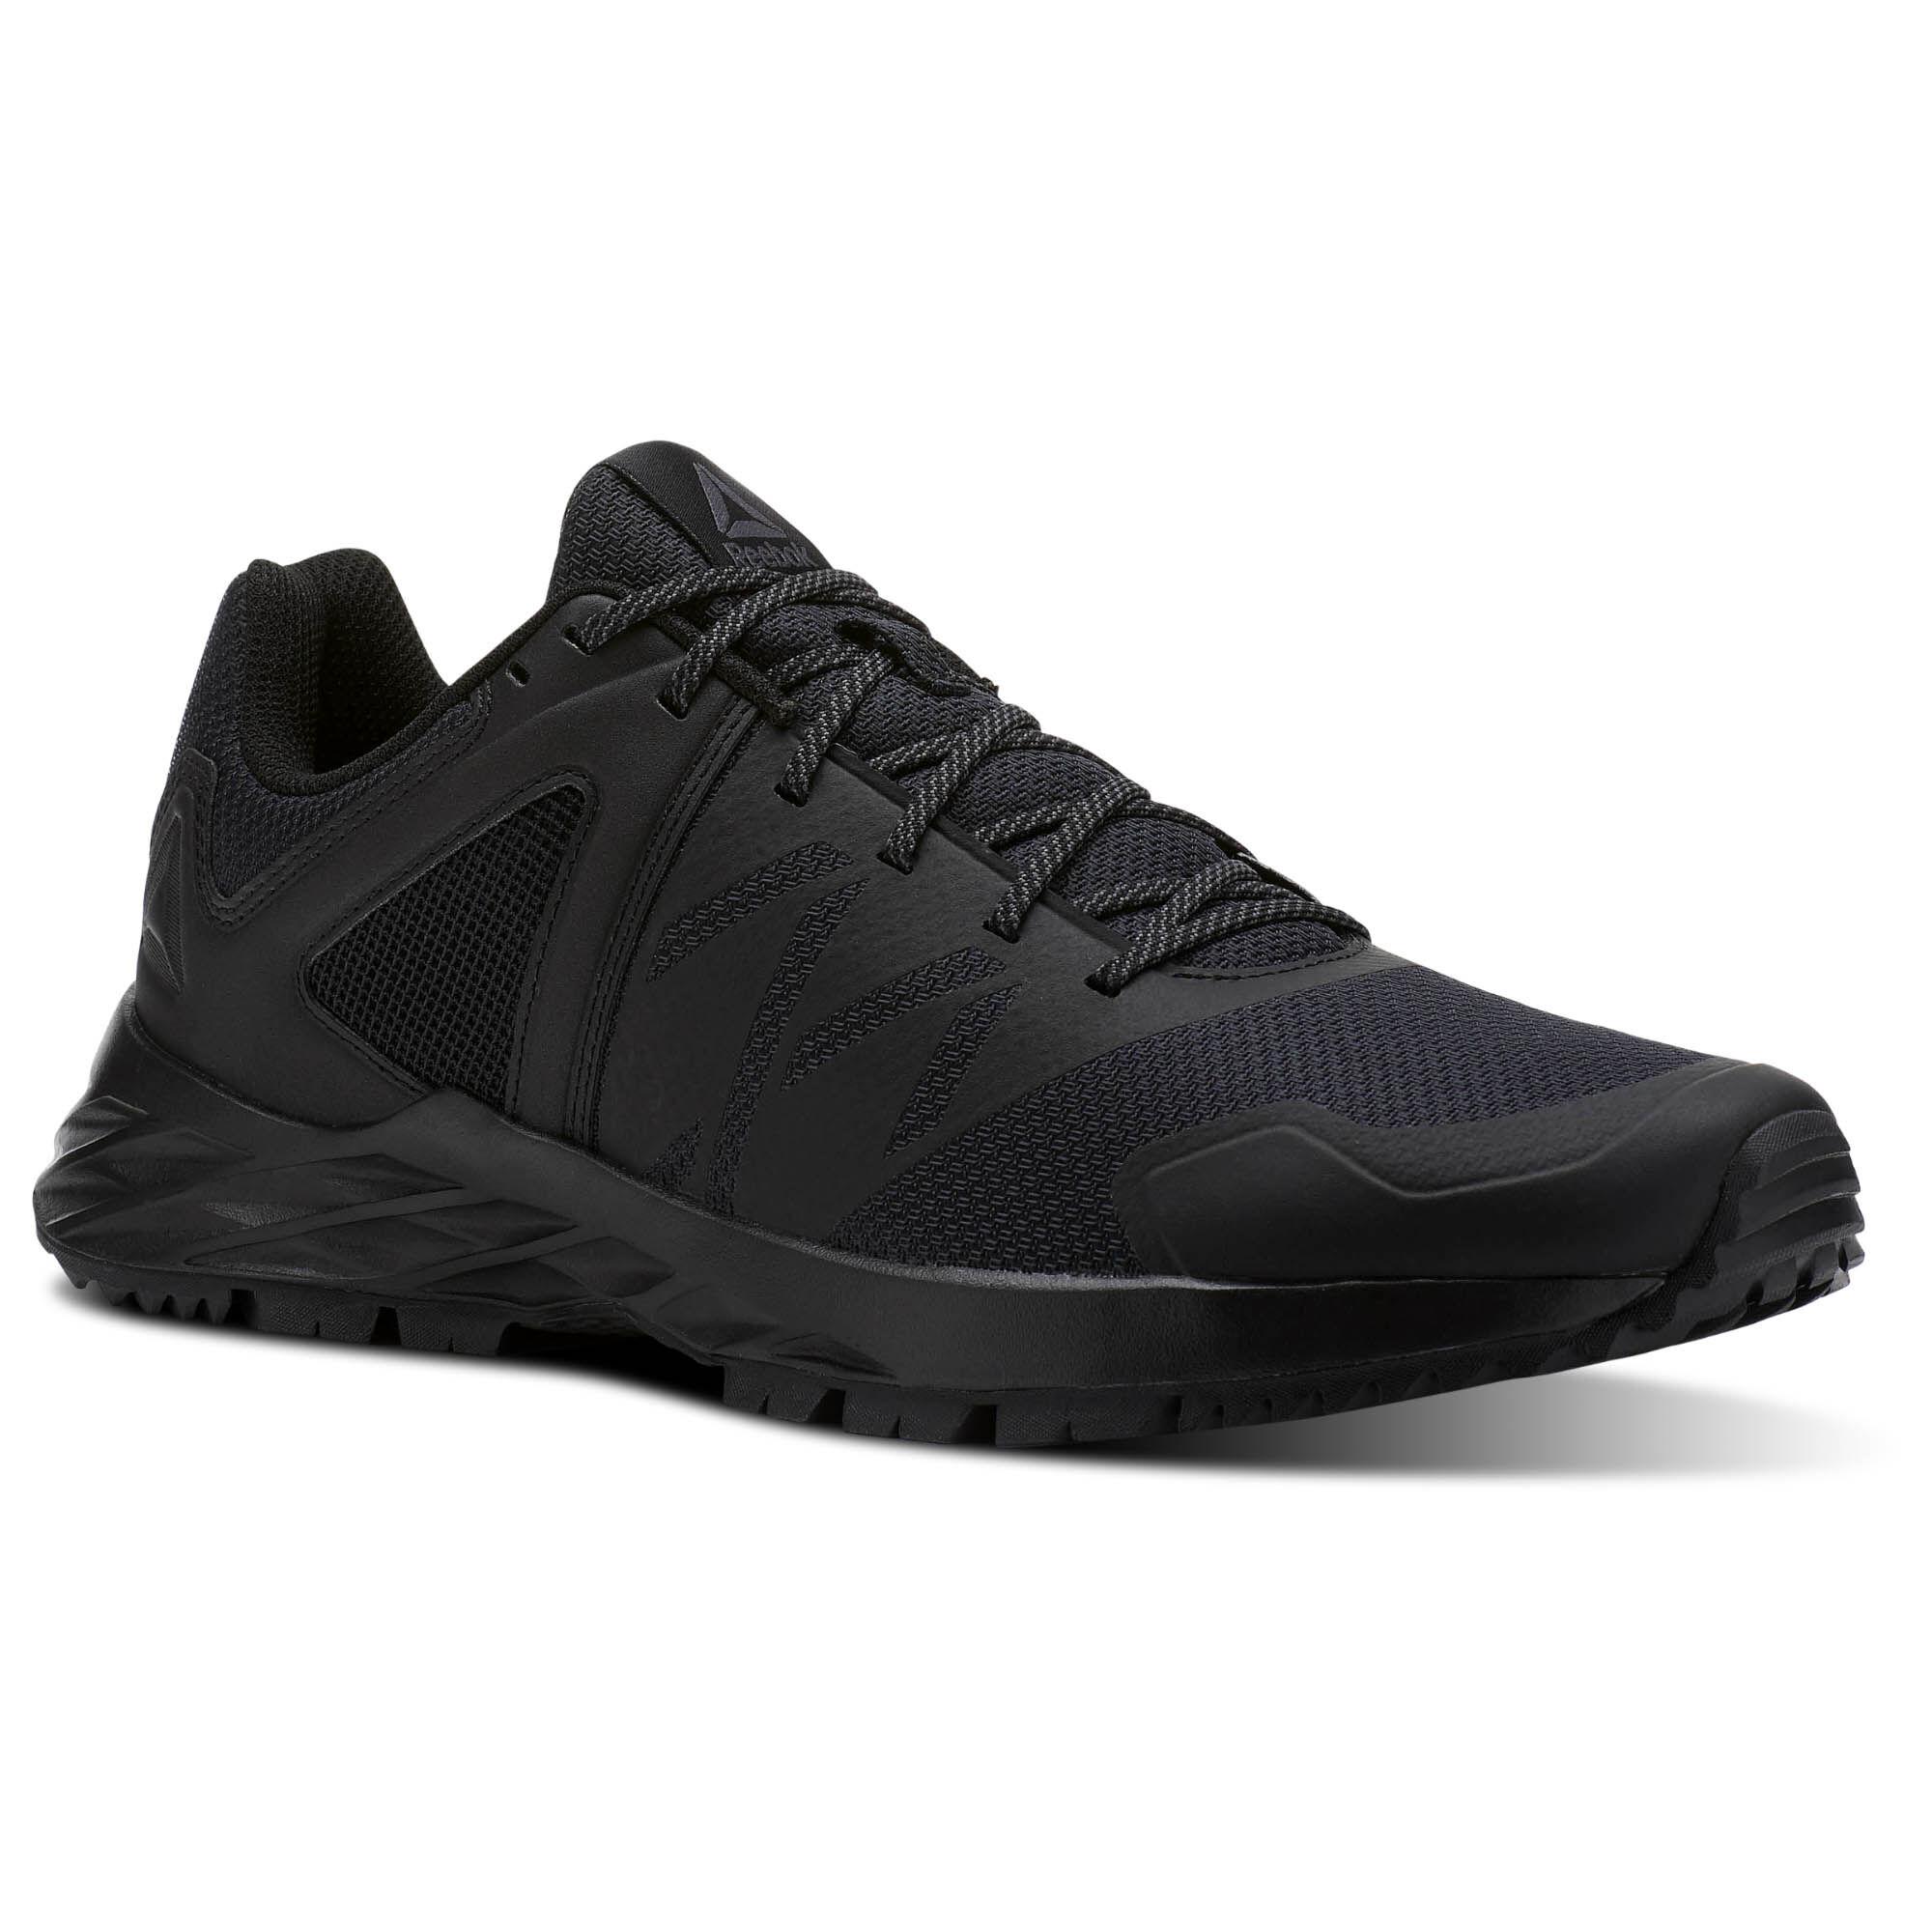 Reebok SAWCUT GTX 6.0 - Trail running shoes - Black/Ash Grey/Primal Red Jdyvm